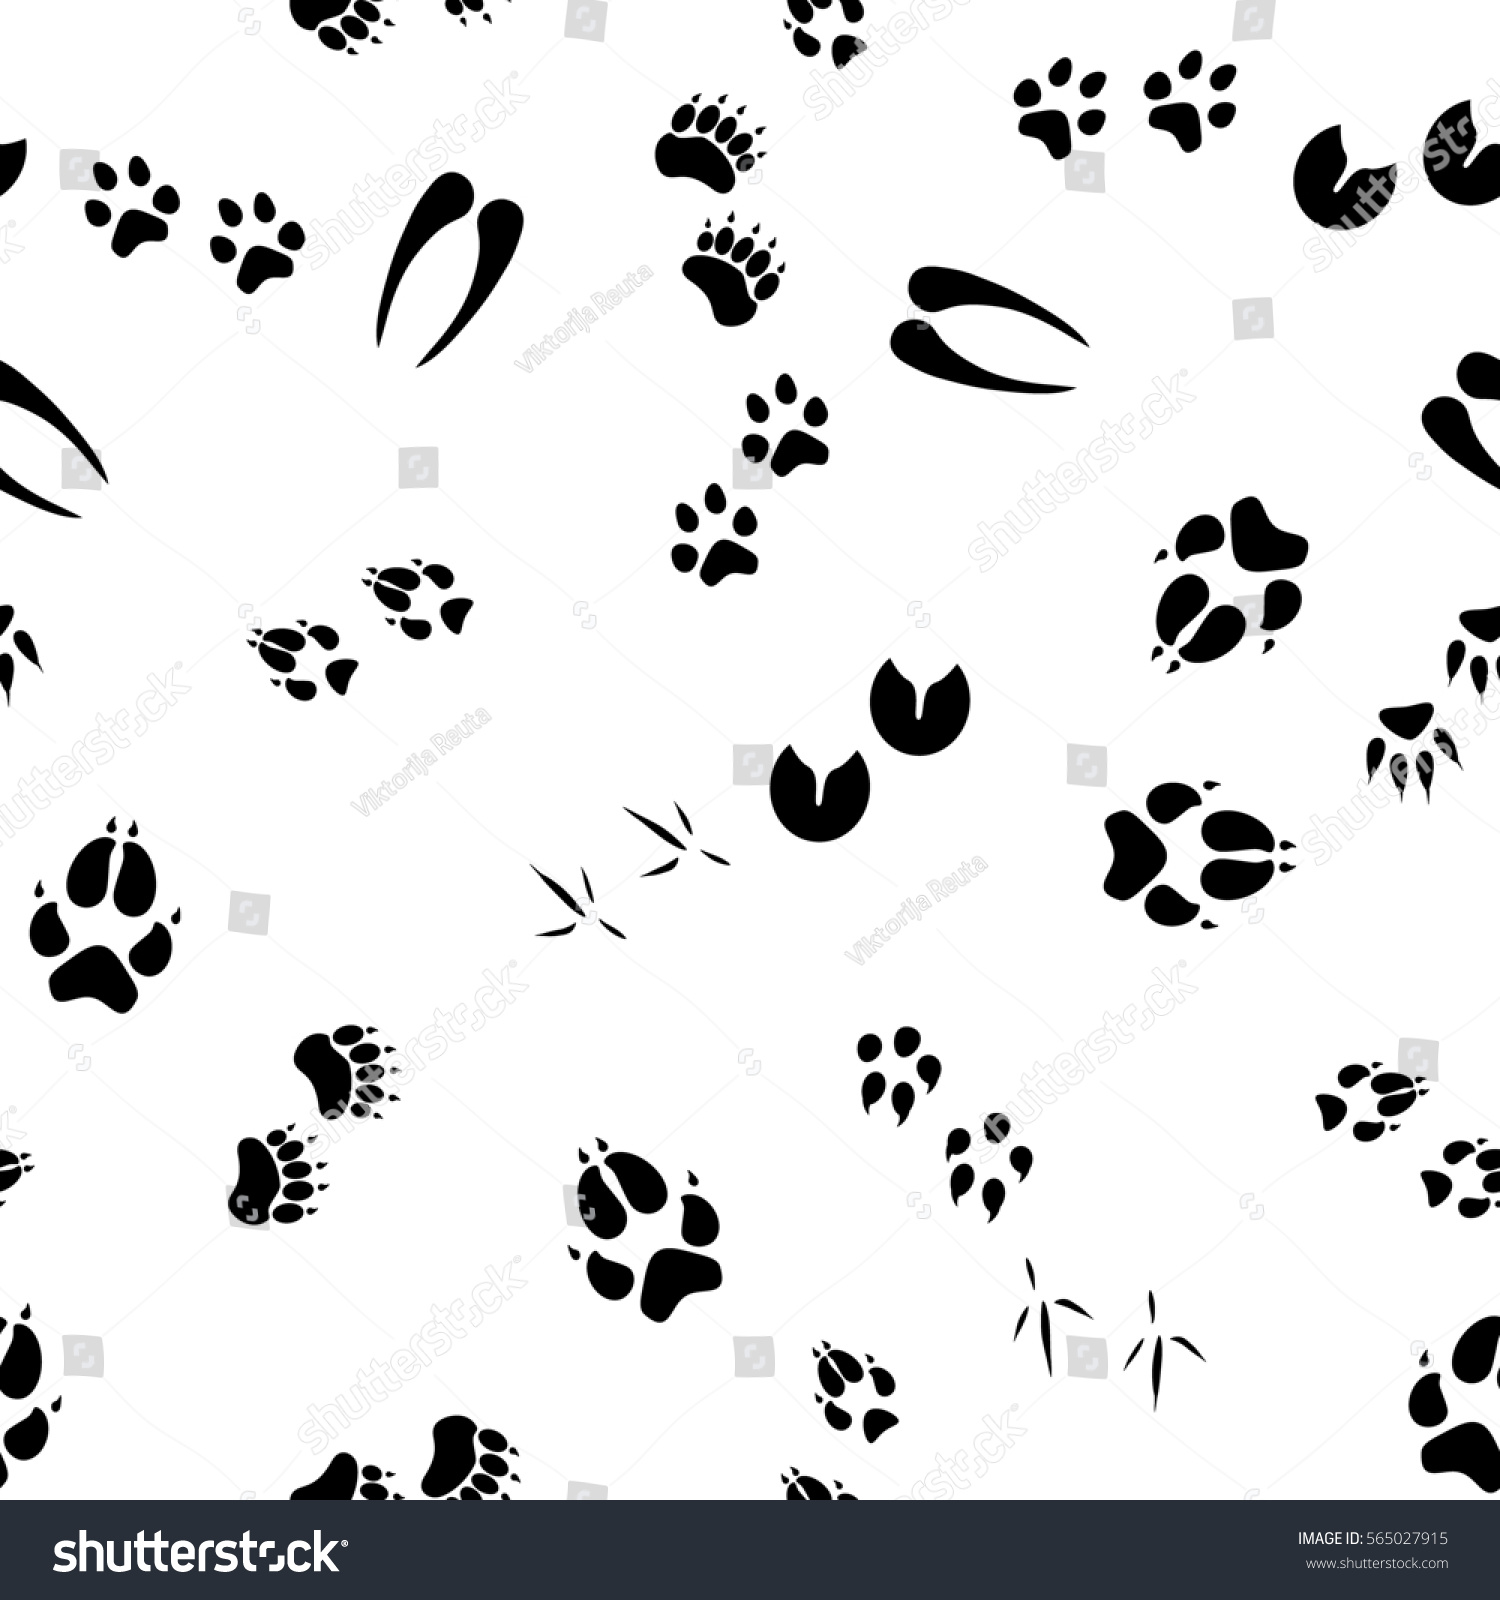 Raster Illustration Pattern Background Footsteps Footprint Stock